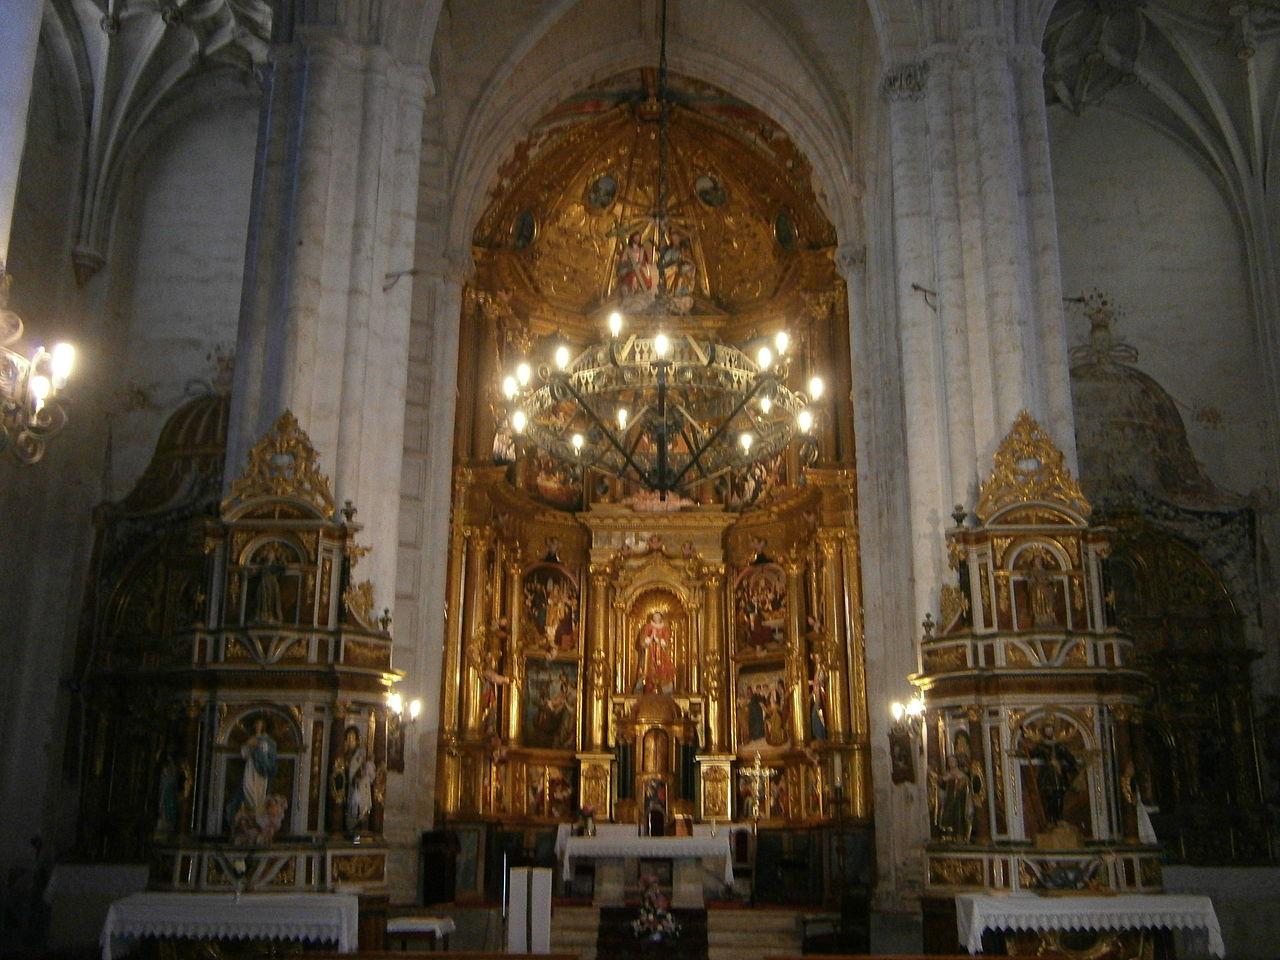 File:Iglesia de San Esteban (Los Balbases) - 8.jpg - Wikimedia Commons